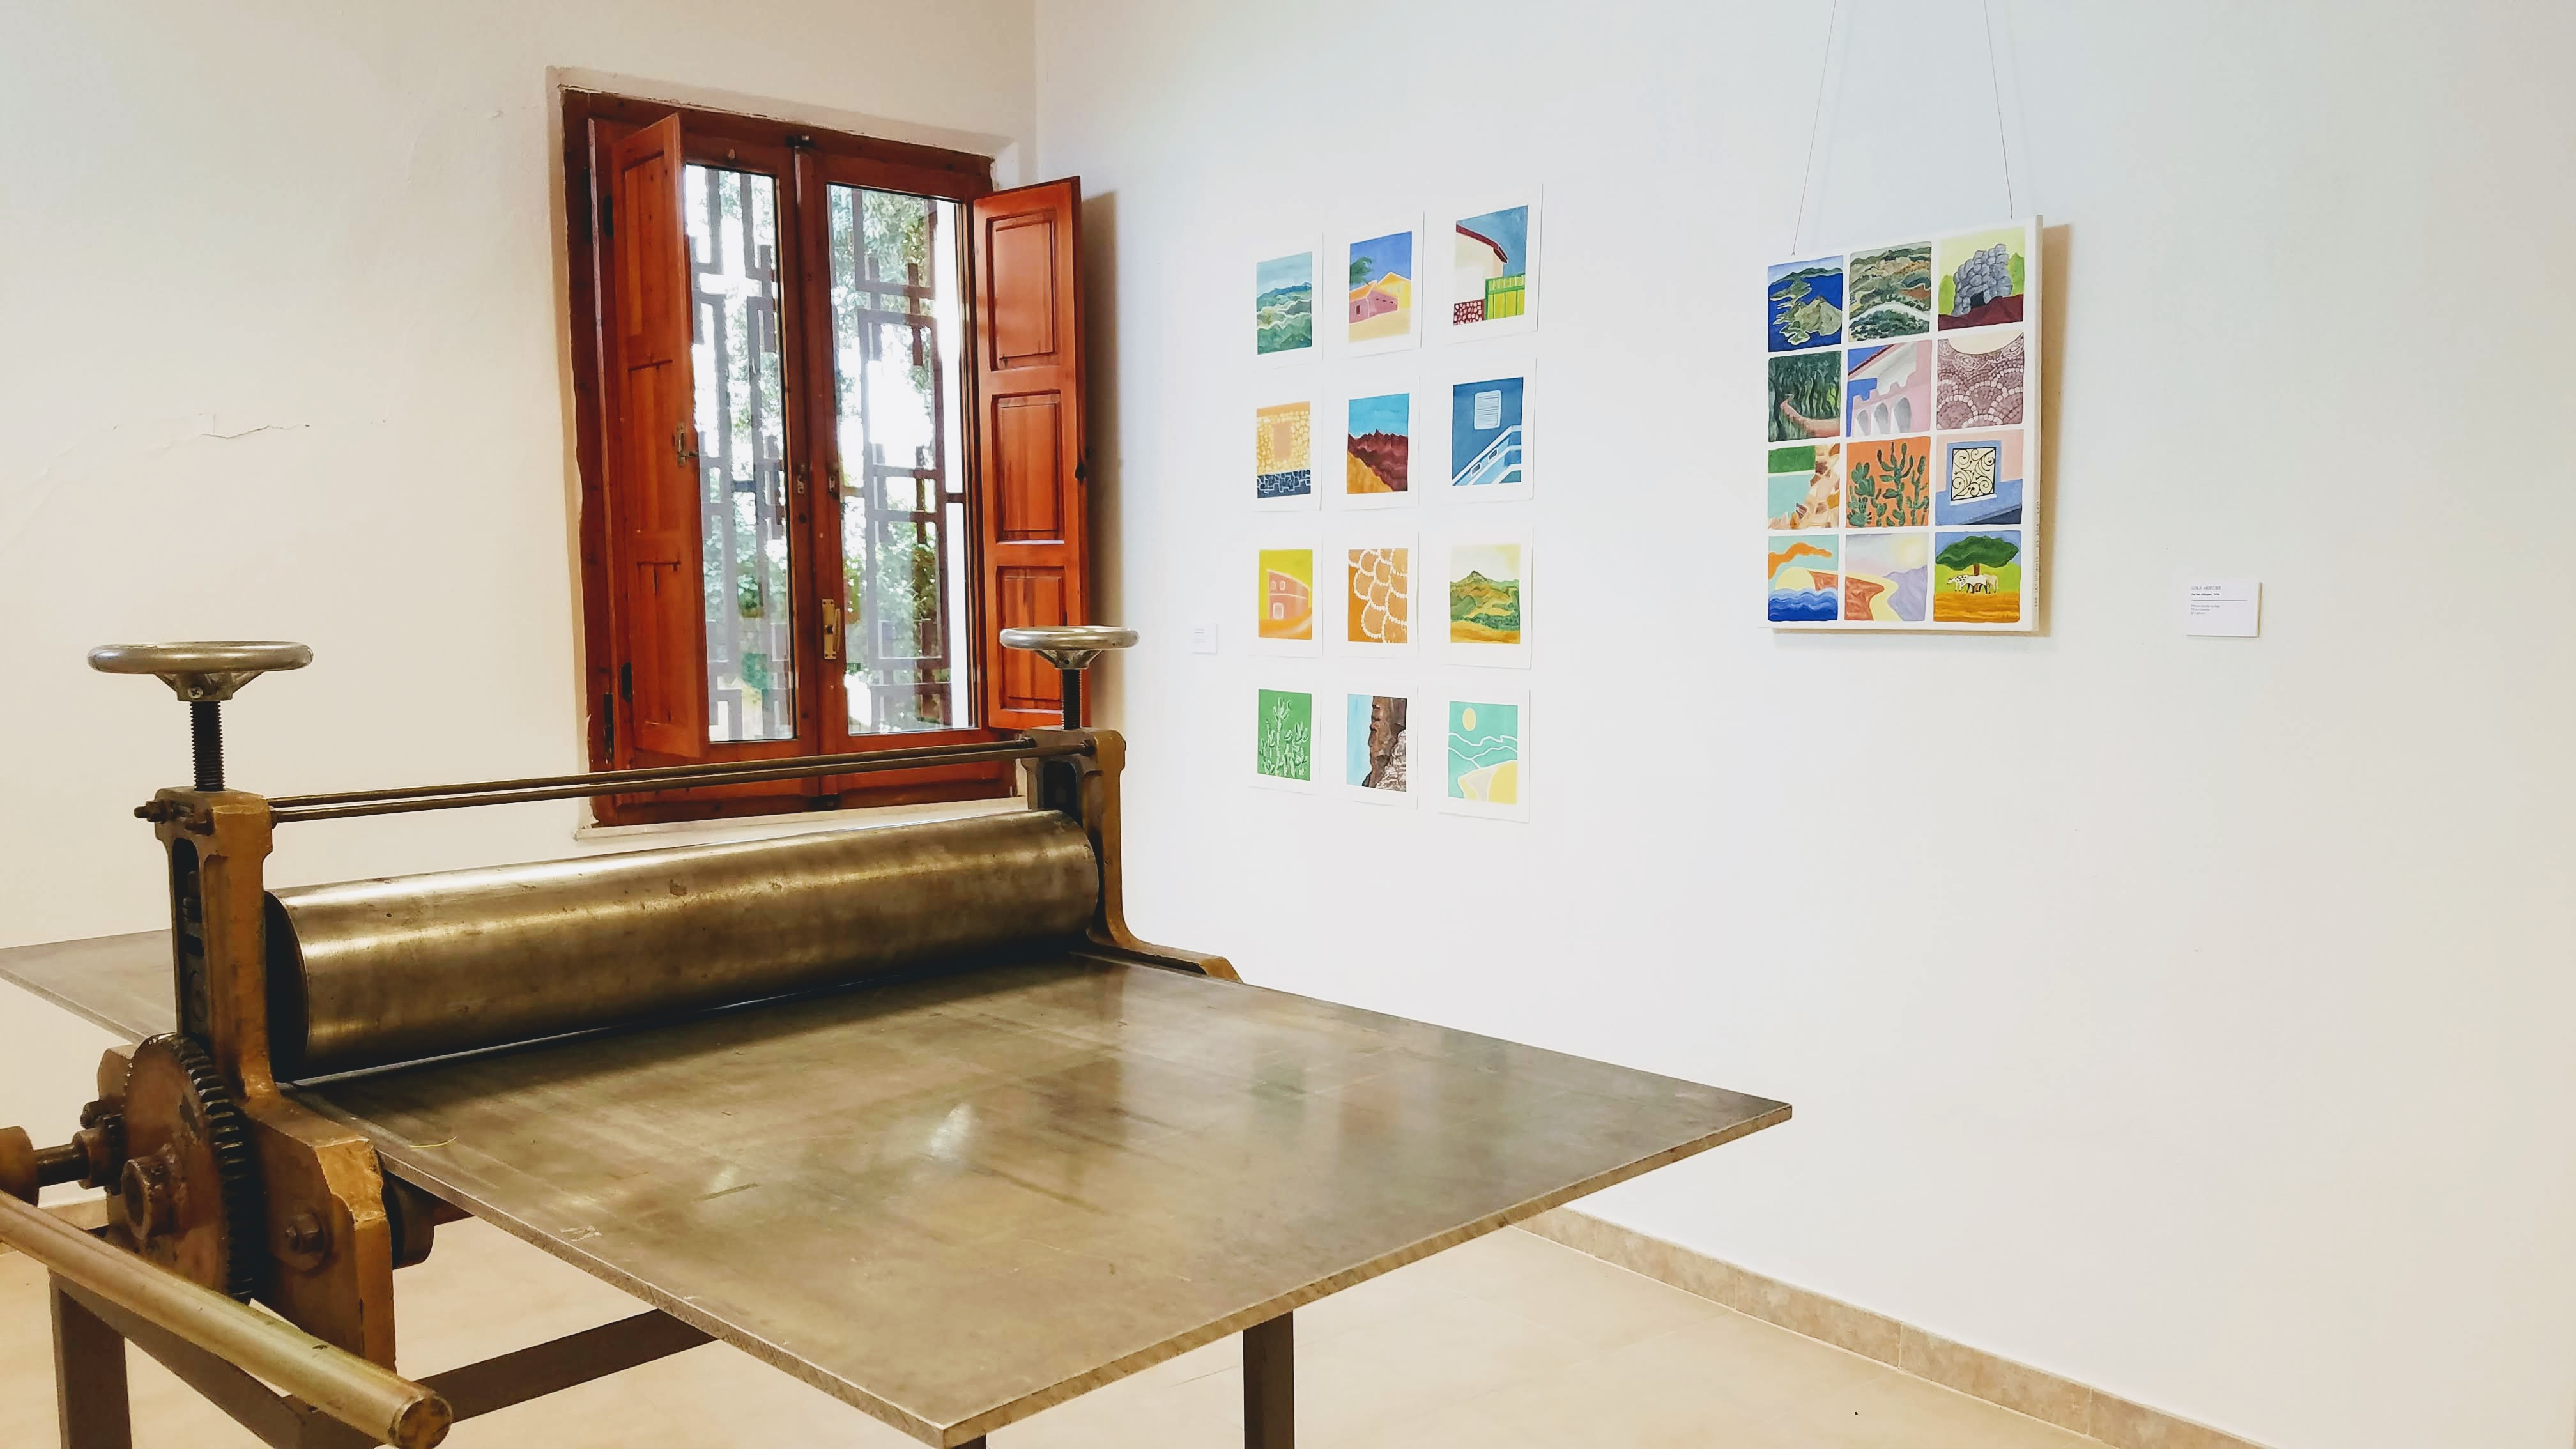 Muvat Spectrapolis Residenze artistiche sardegna art music incontro artista performance residence artistique